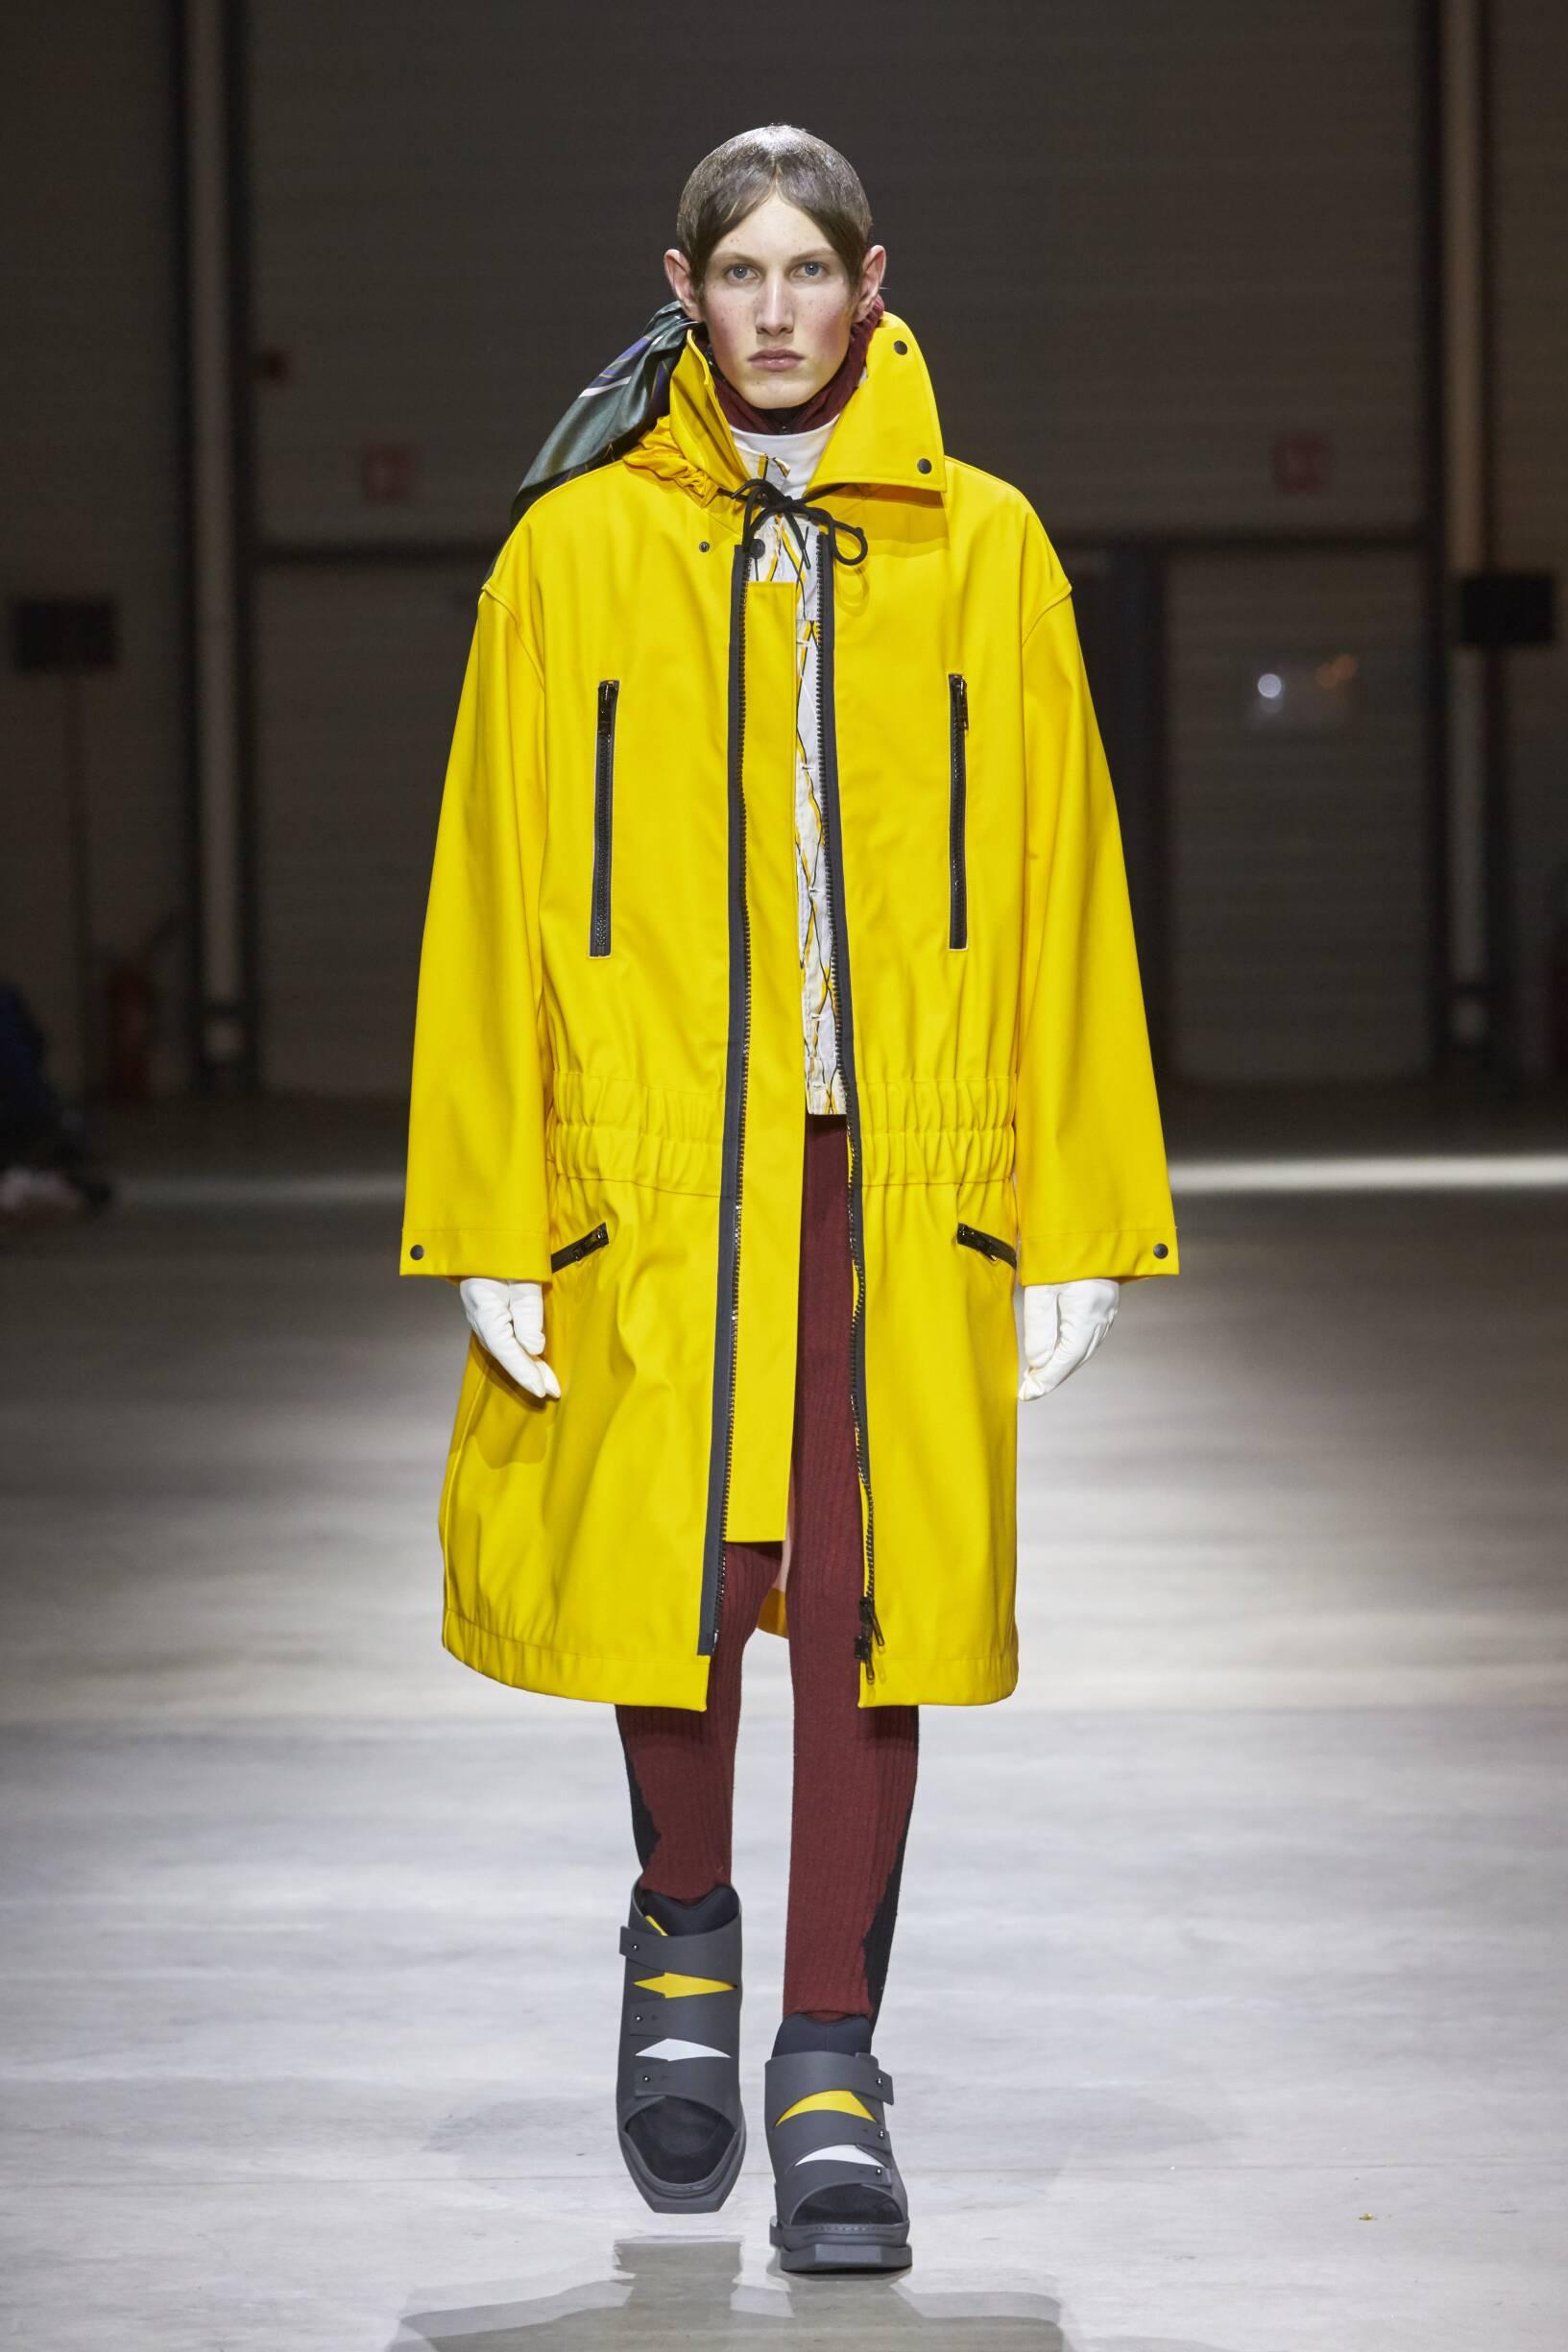 Kenzo FW 2017 Menswear